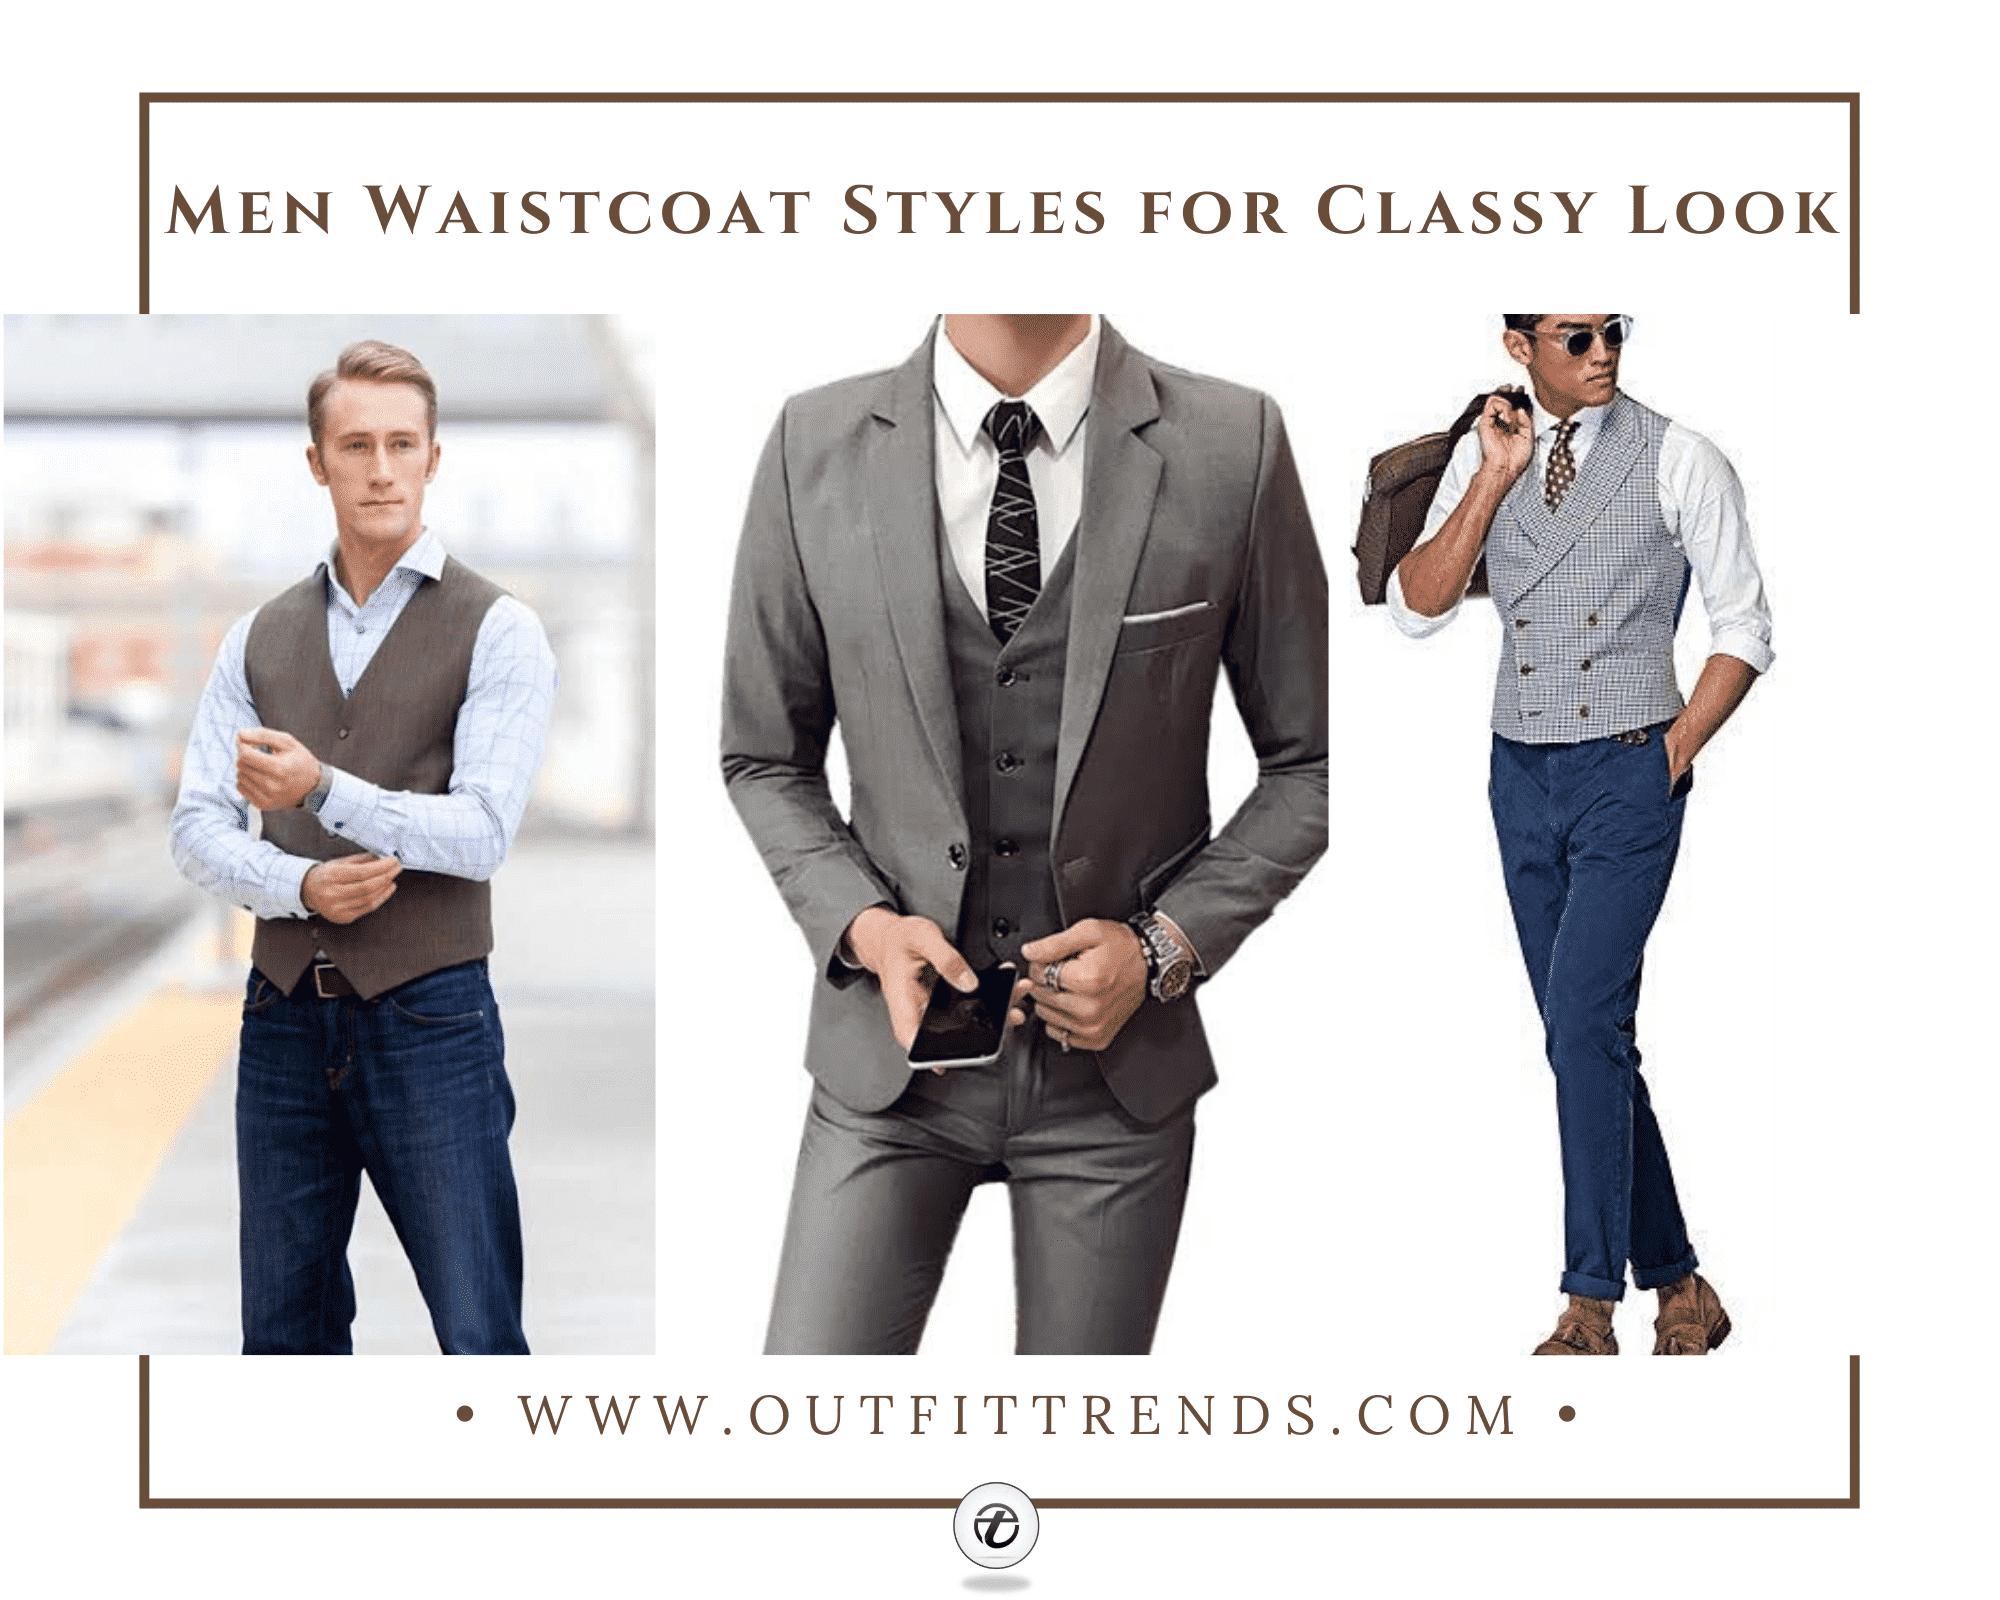 Men Waistcoat Styles18 Ways to Wear Waistcoat for Classy Look